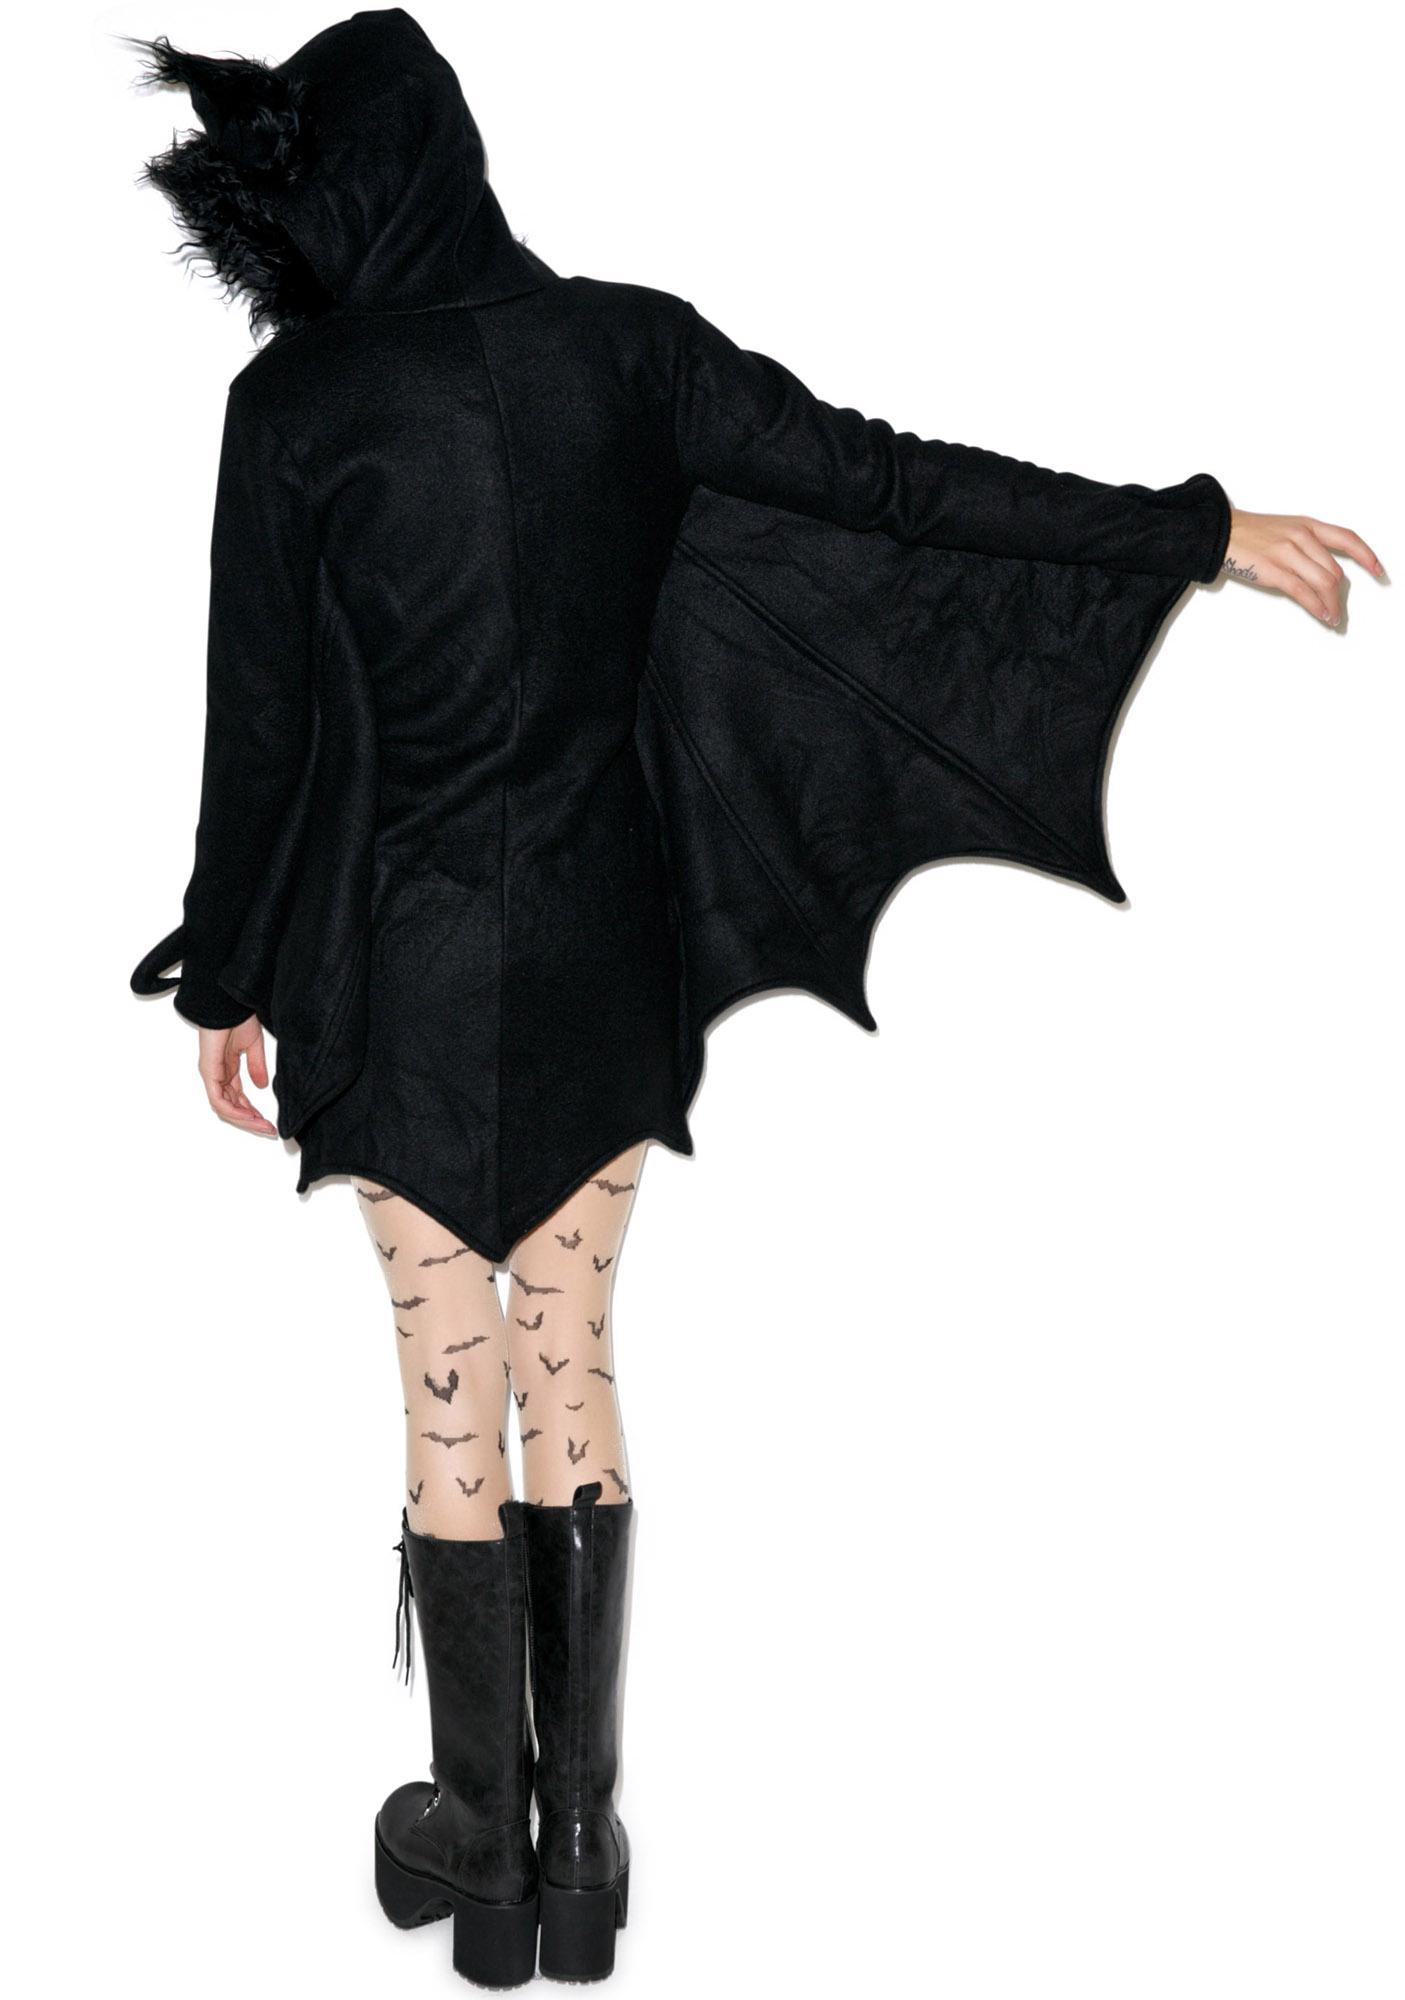 Hangin' Out Bat Hoodie